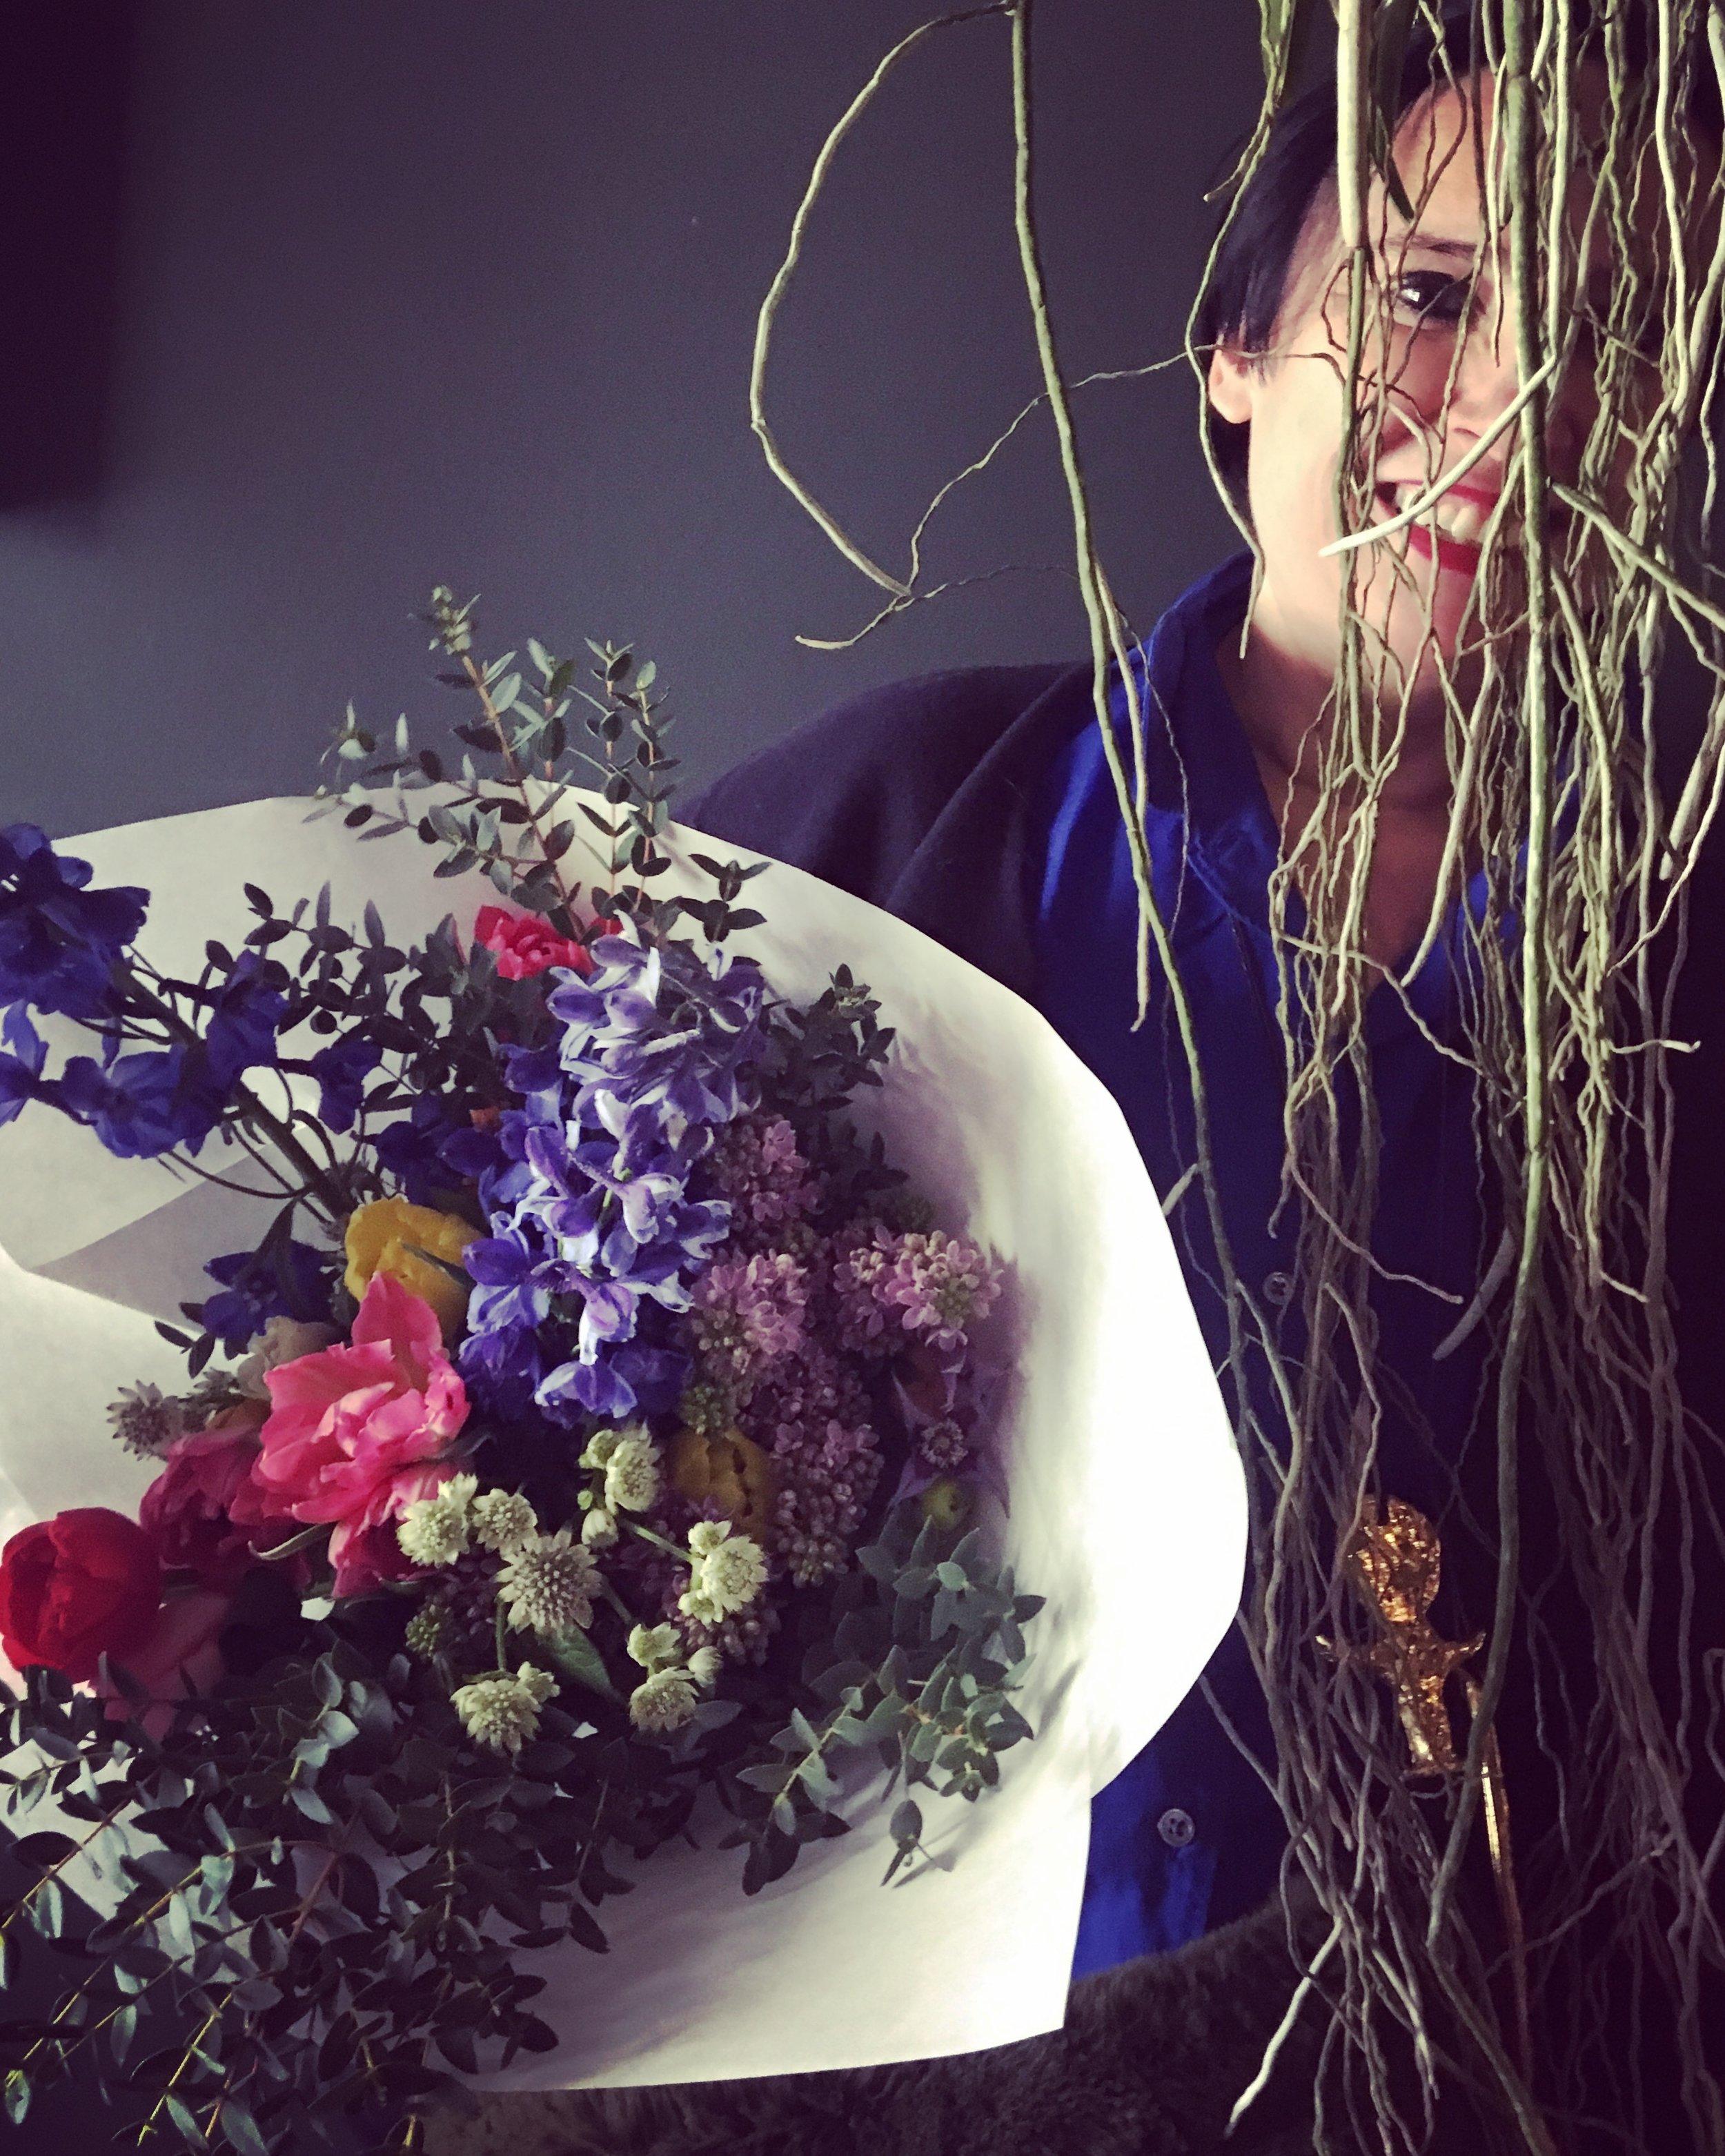 Happy customer & flowerslover @formeslibres . March 2019 - photo by Hortense T.